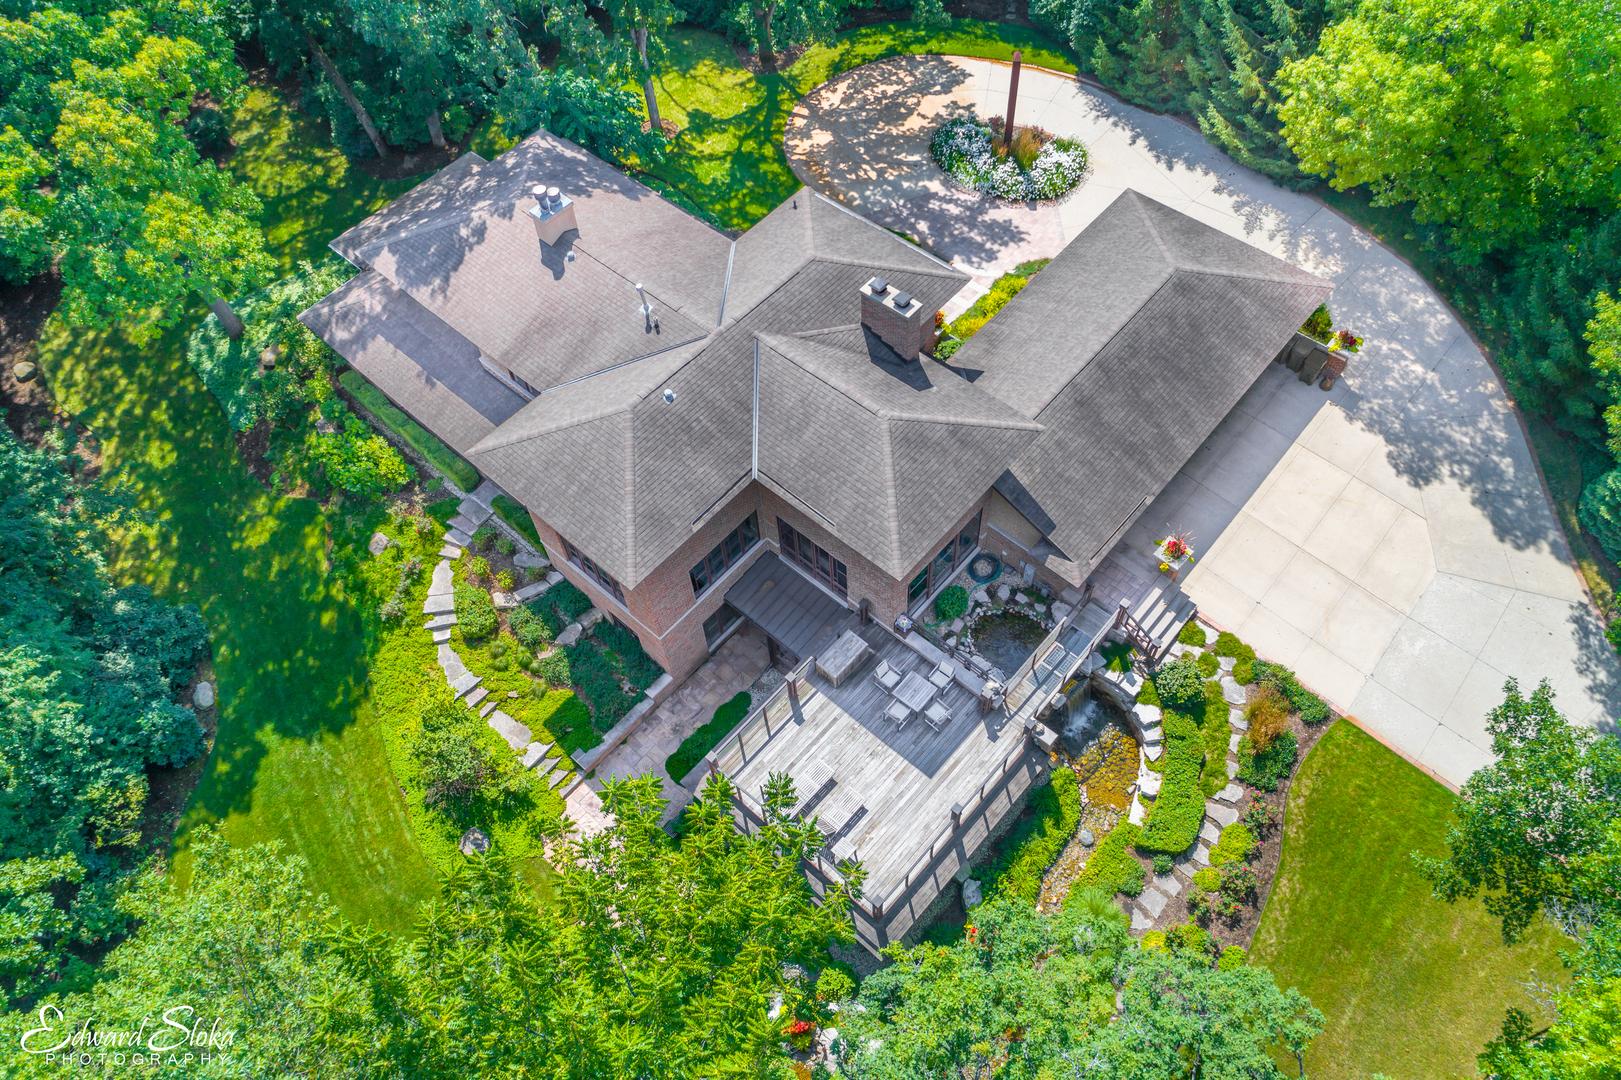 7611 Oak Ridge Court, Crystal Lake, 60012, MLS # 10131603   Keefe Real  Estate